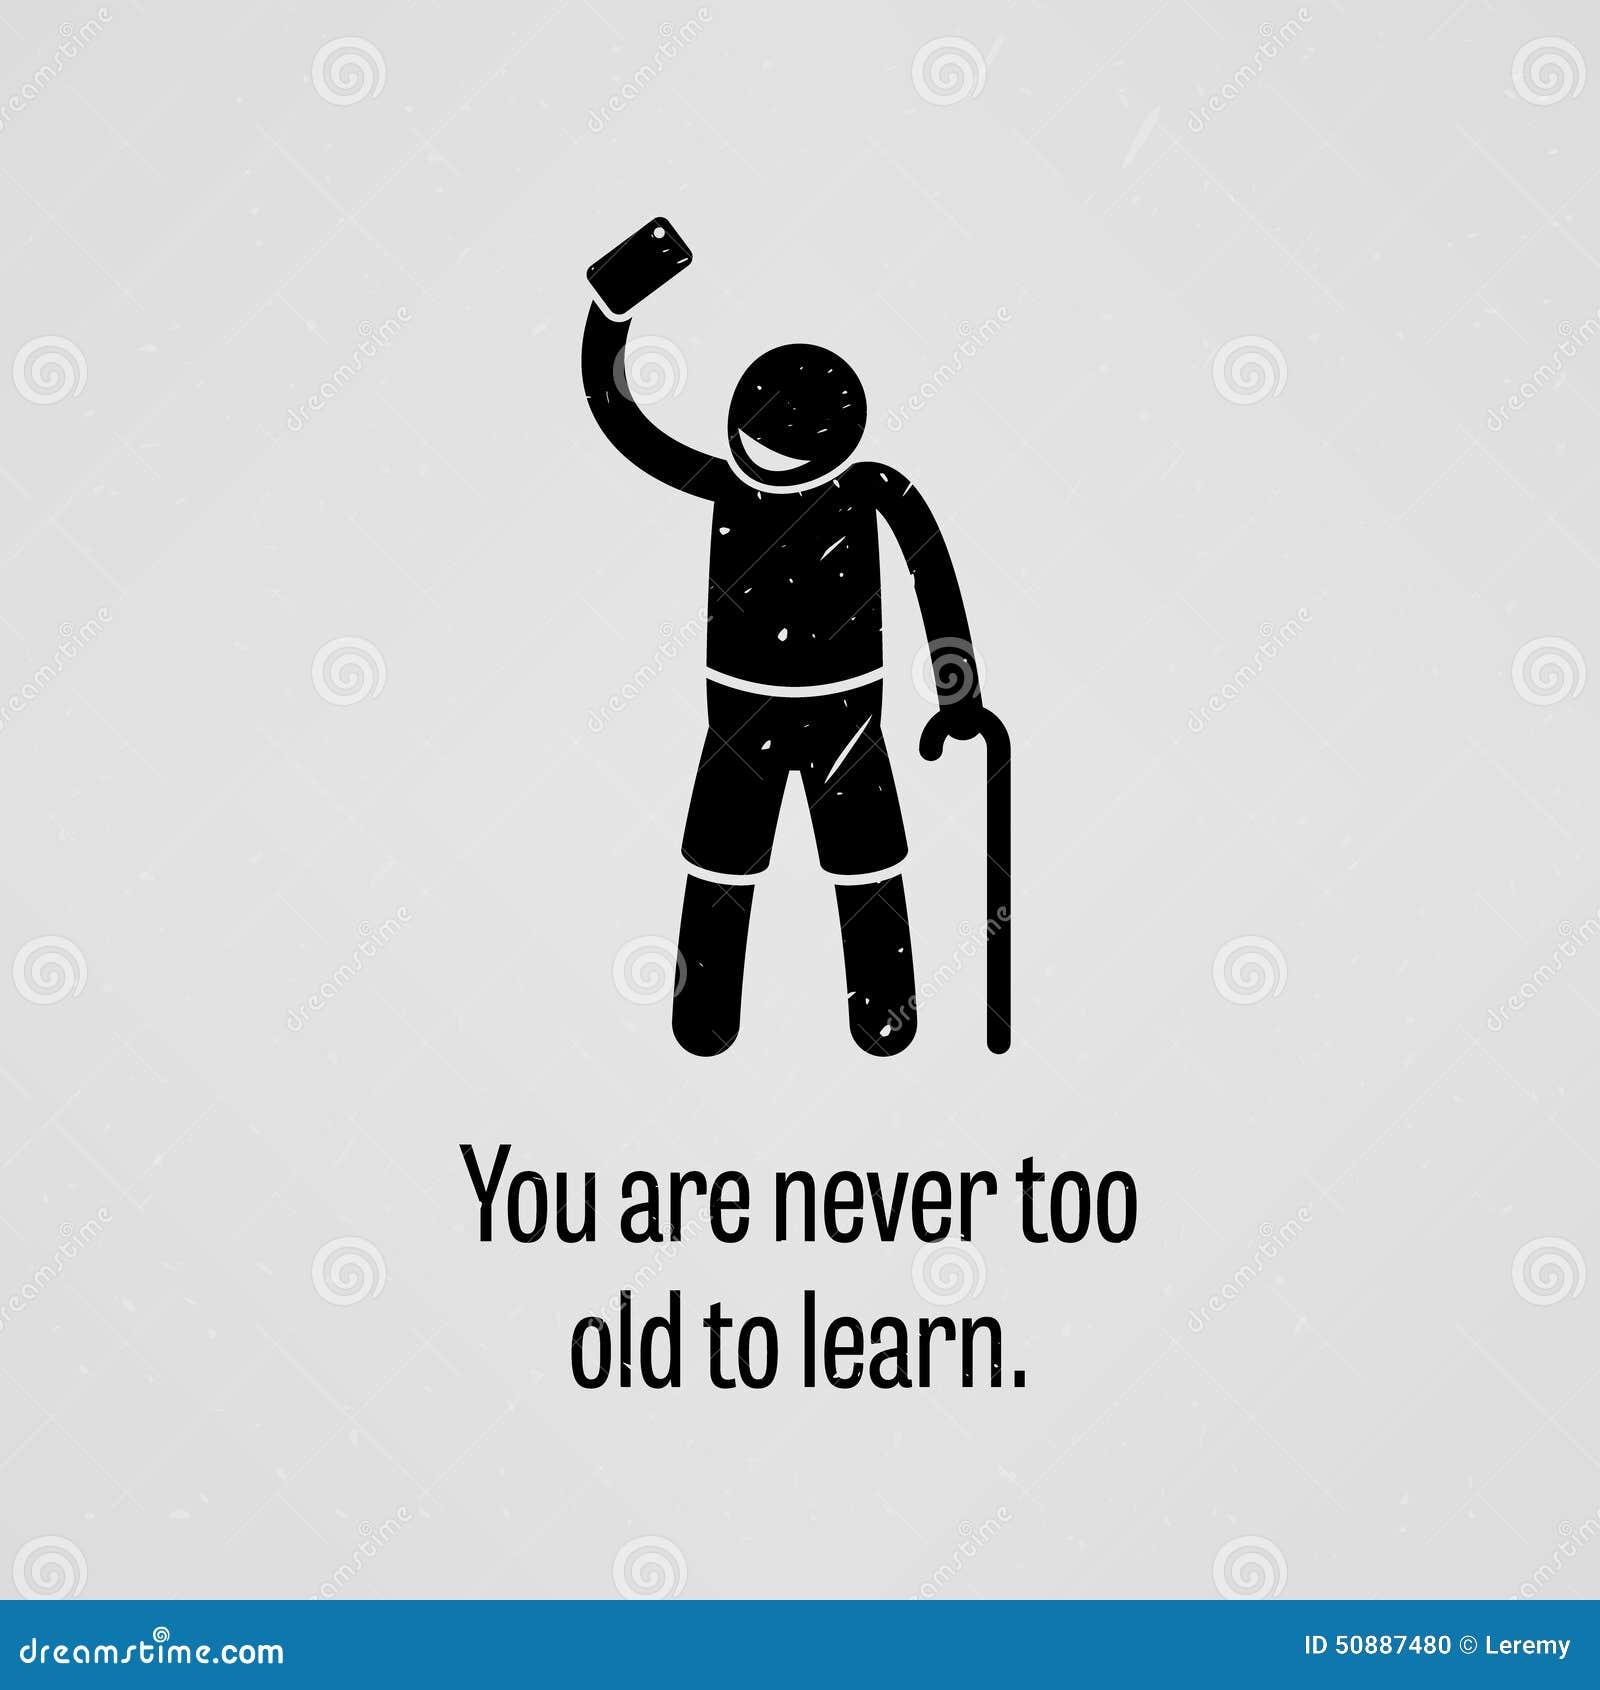 you are never too old to You are never too old on scratch by smileyface72.